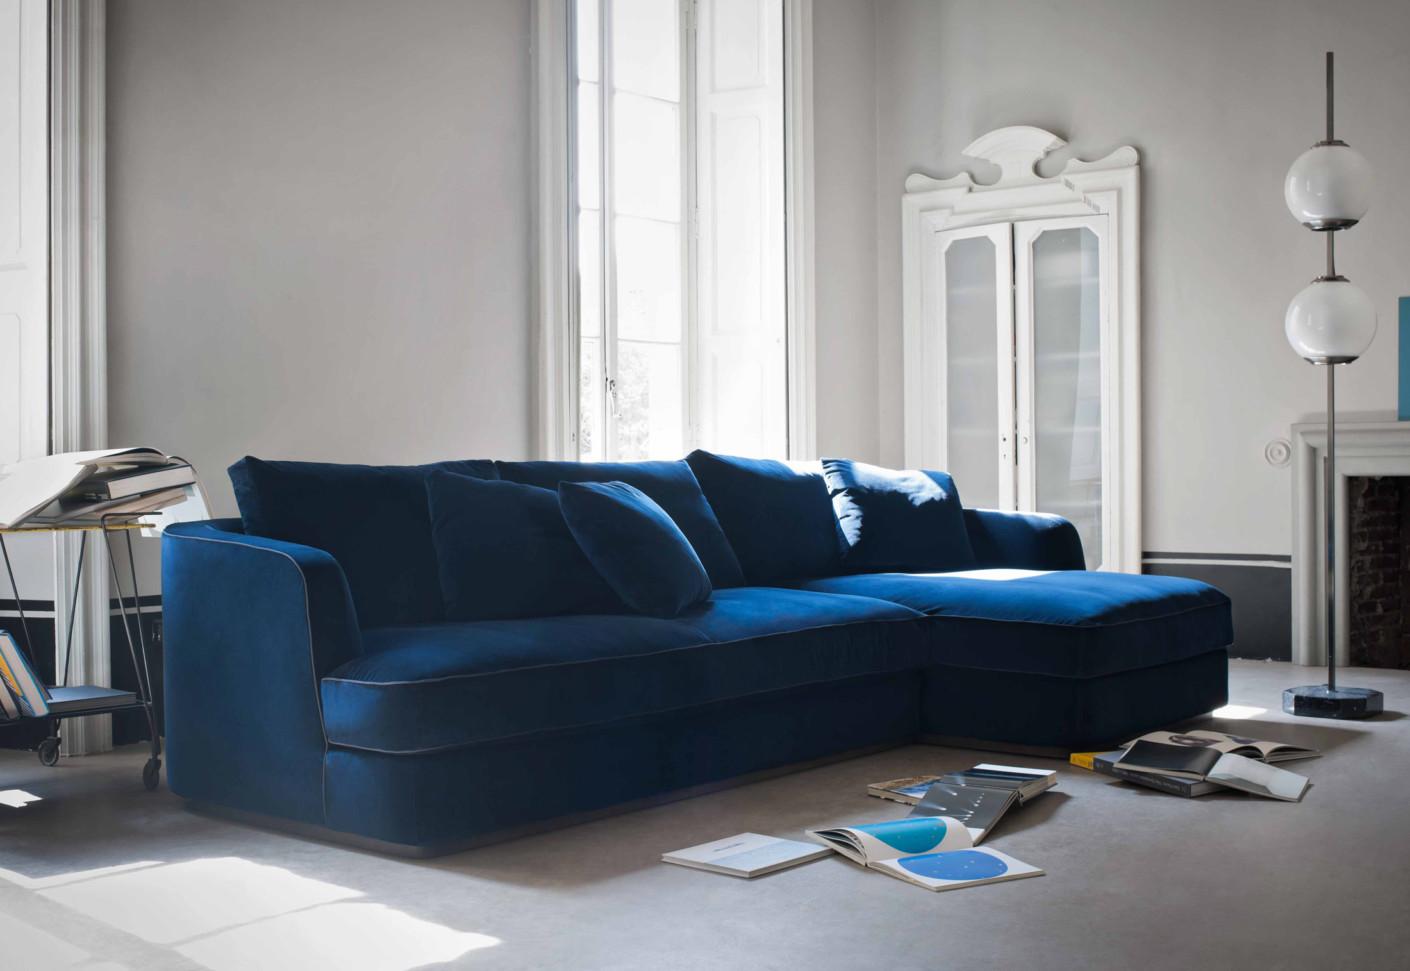 flexform sectional sofa Okaycreationsnet